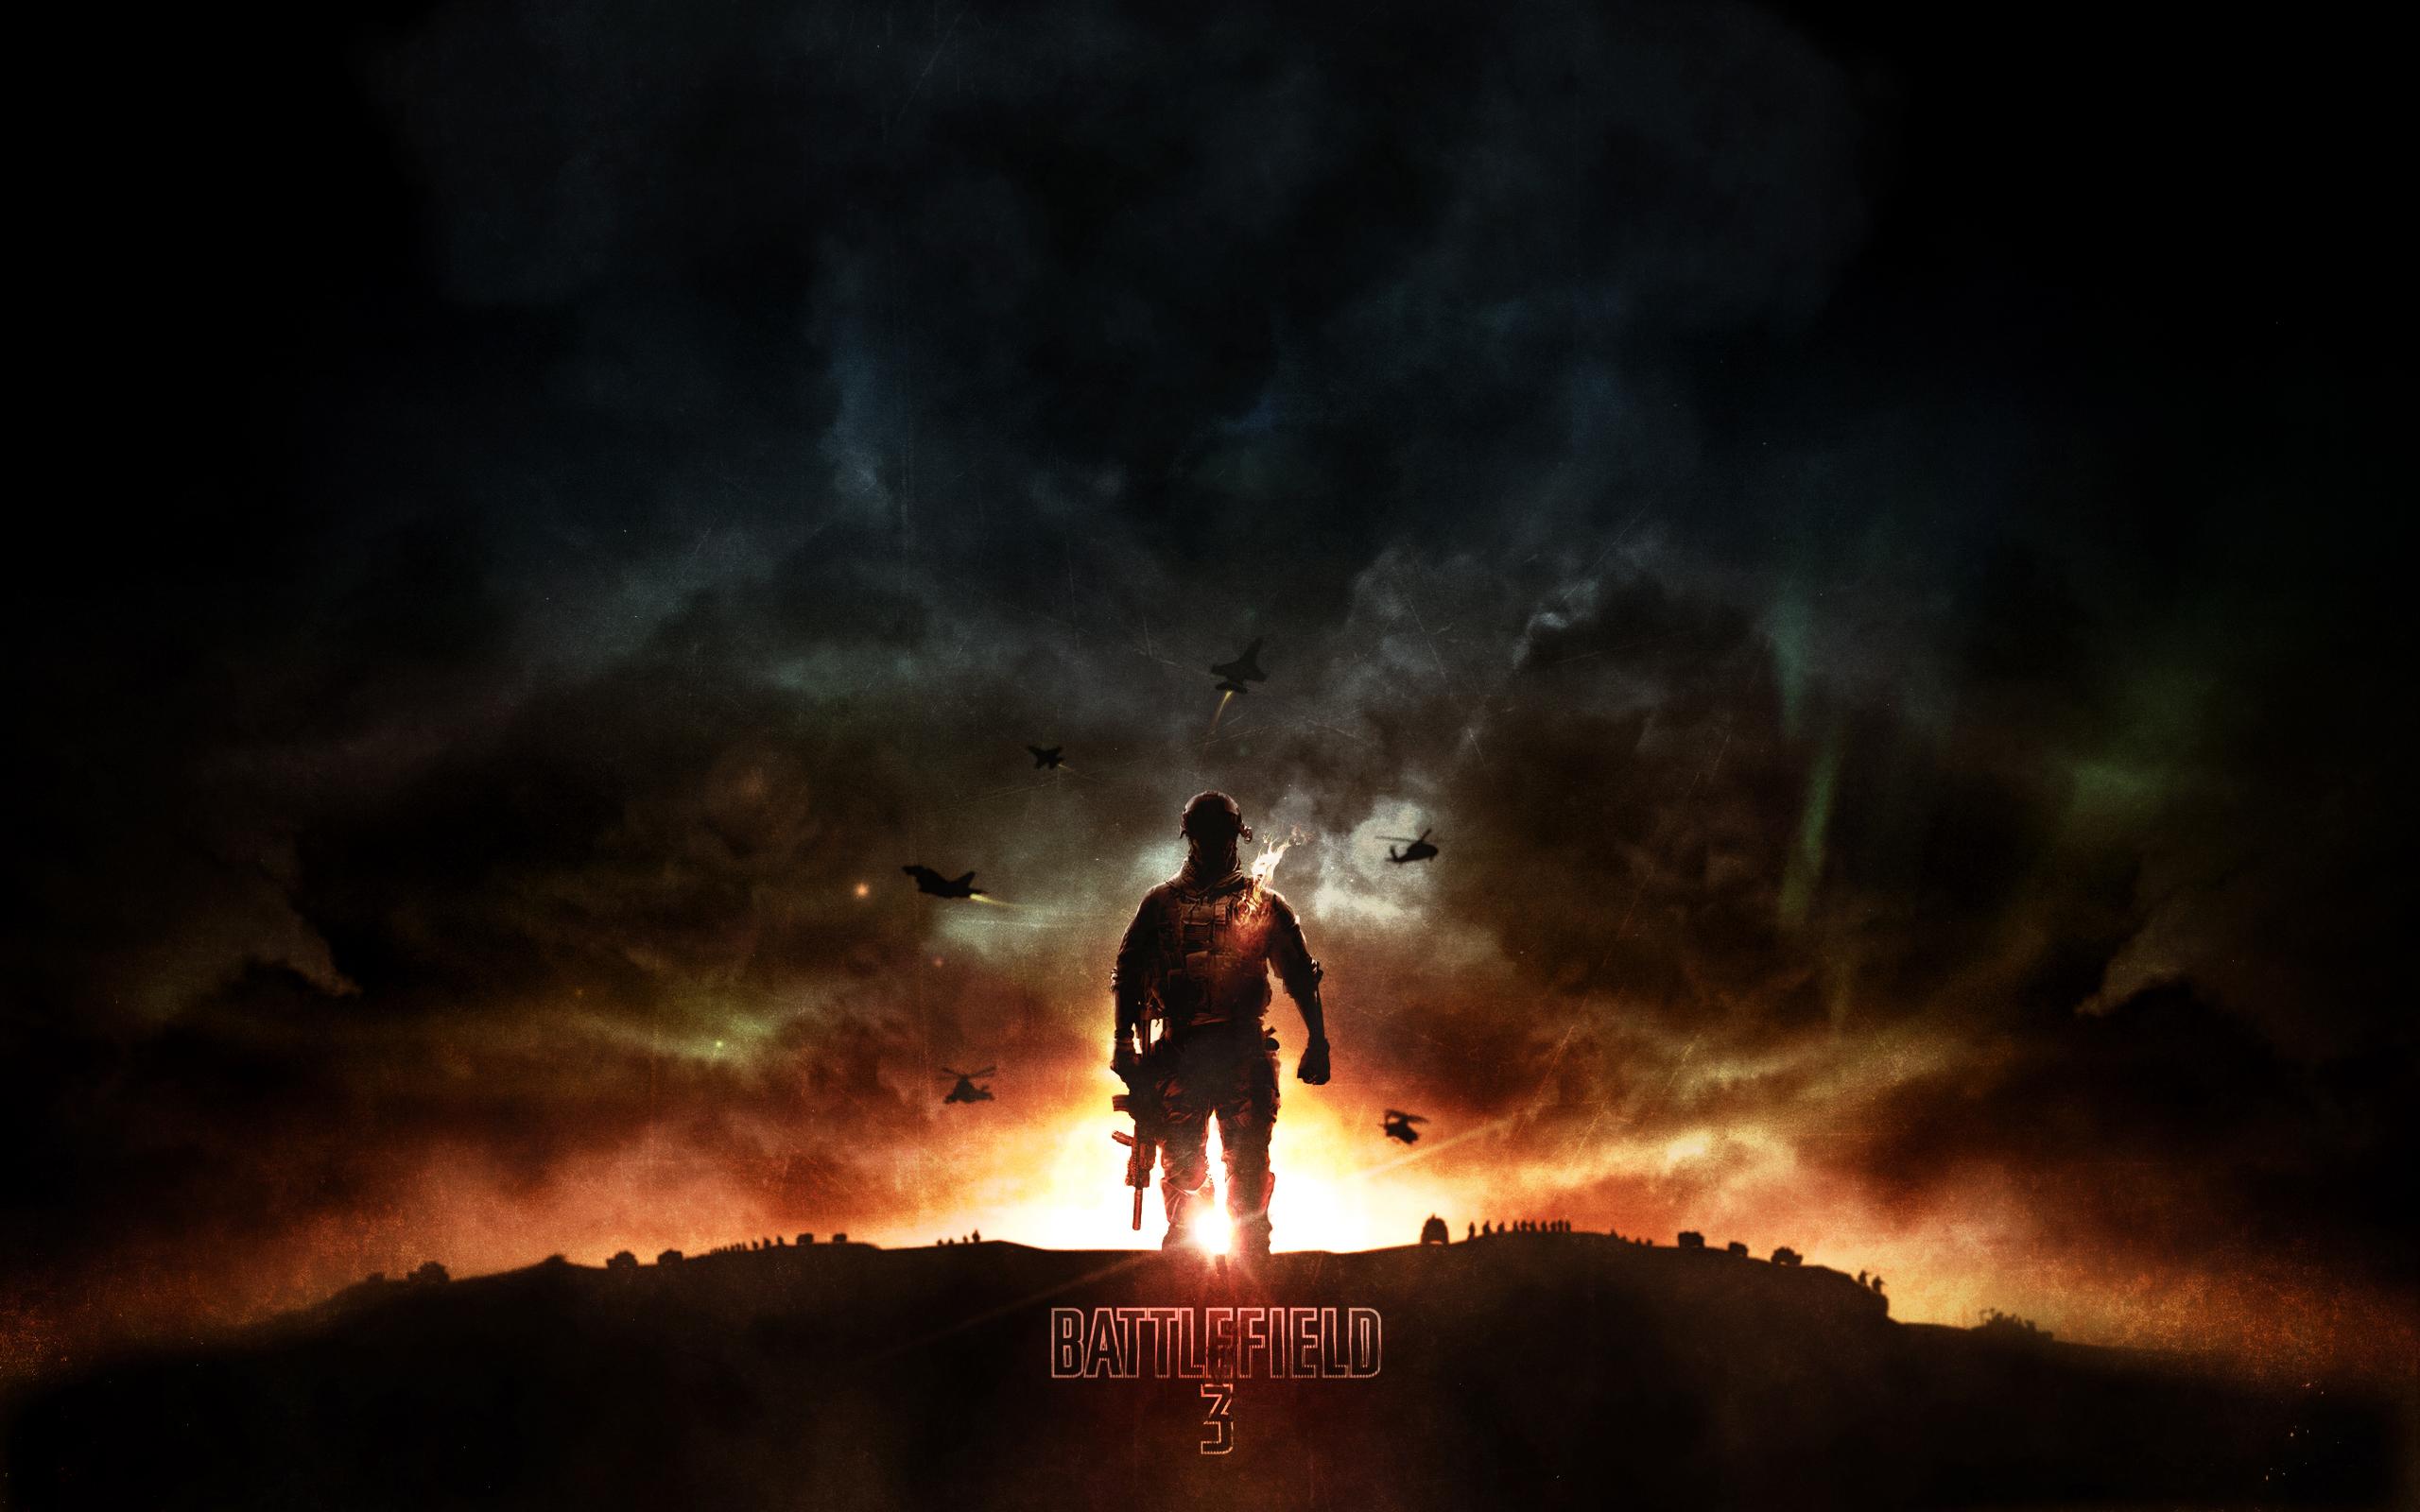 New Battlefield 3 Wallpapers HD Wallpapers 2560x1600